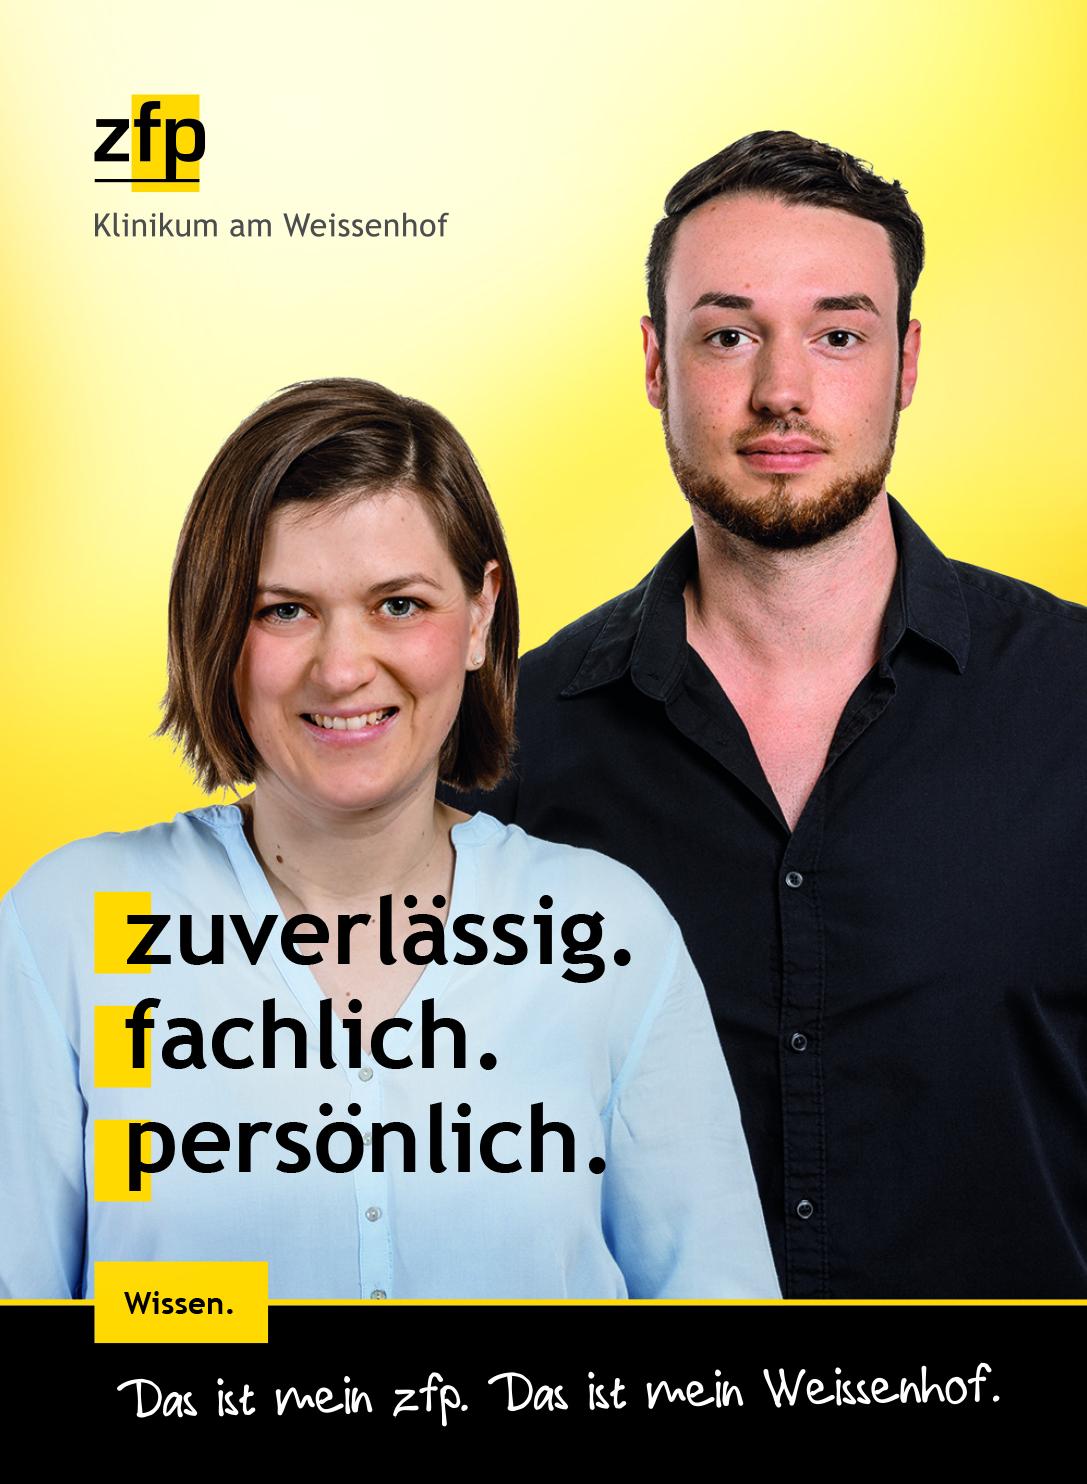 Assistenzarzt (m/w/d) - Klinikum am Weissenhof - Header